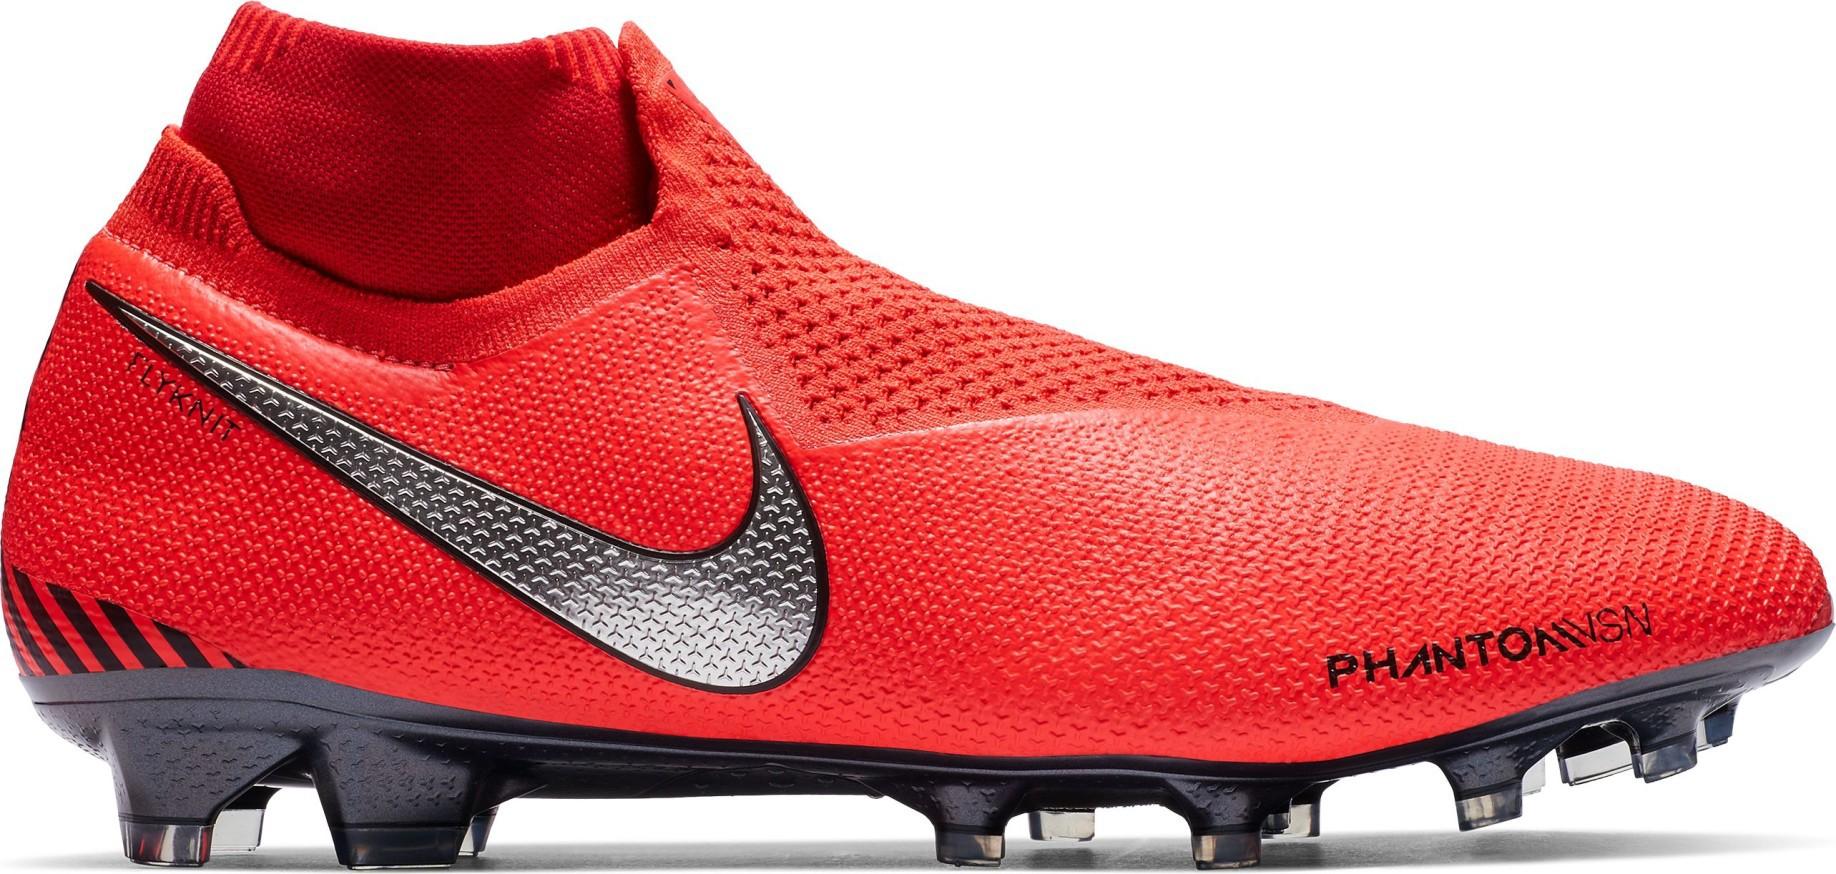 6c7fbf47d34c2d Nike Football boots Phantom Vision Elite DF